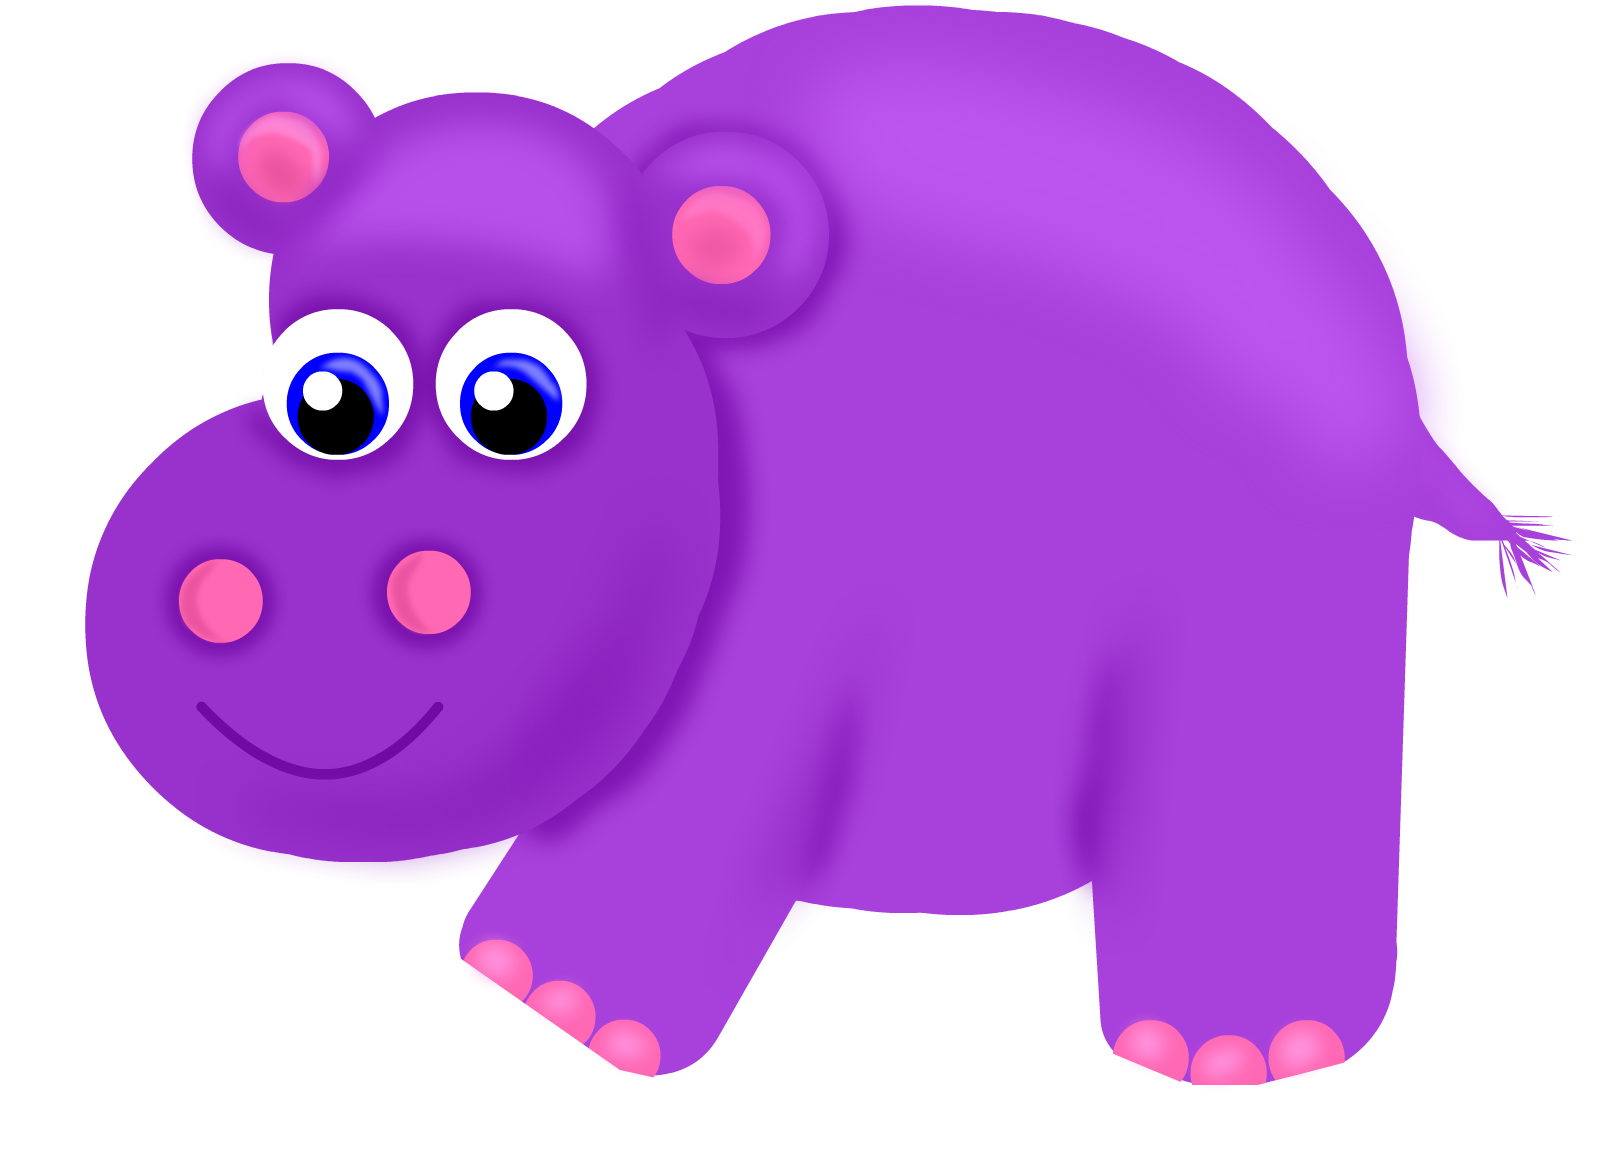 Uncategorized Hippo Drawings purple hippo drawings sketchport hippo